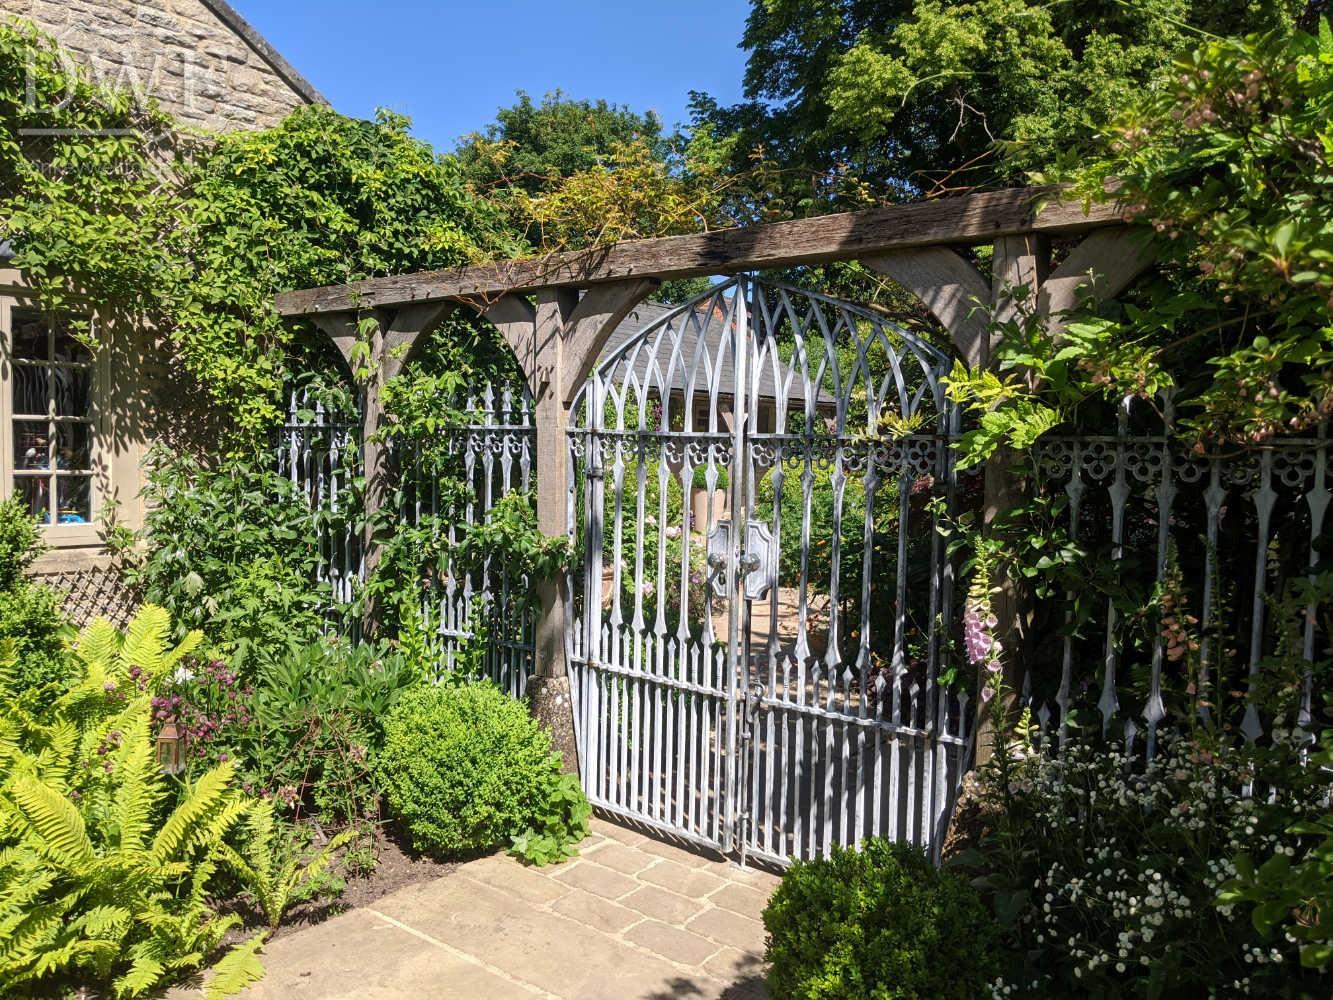 gothic-garden-gates-railings-traditional-ironwork